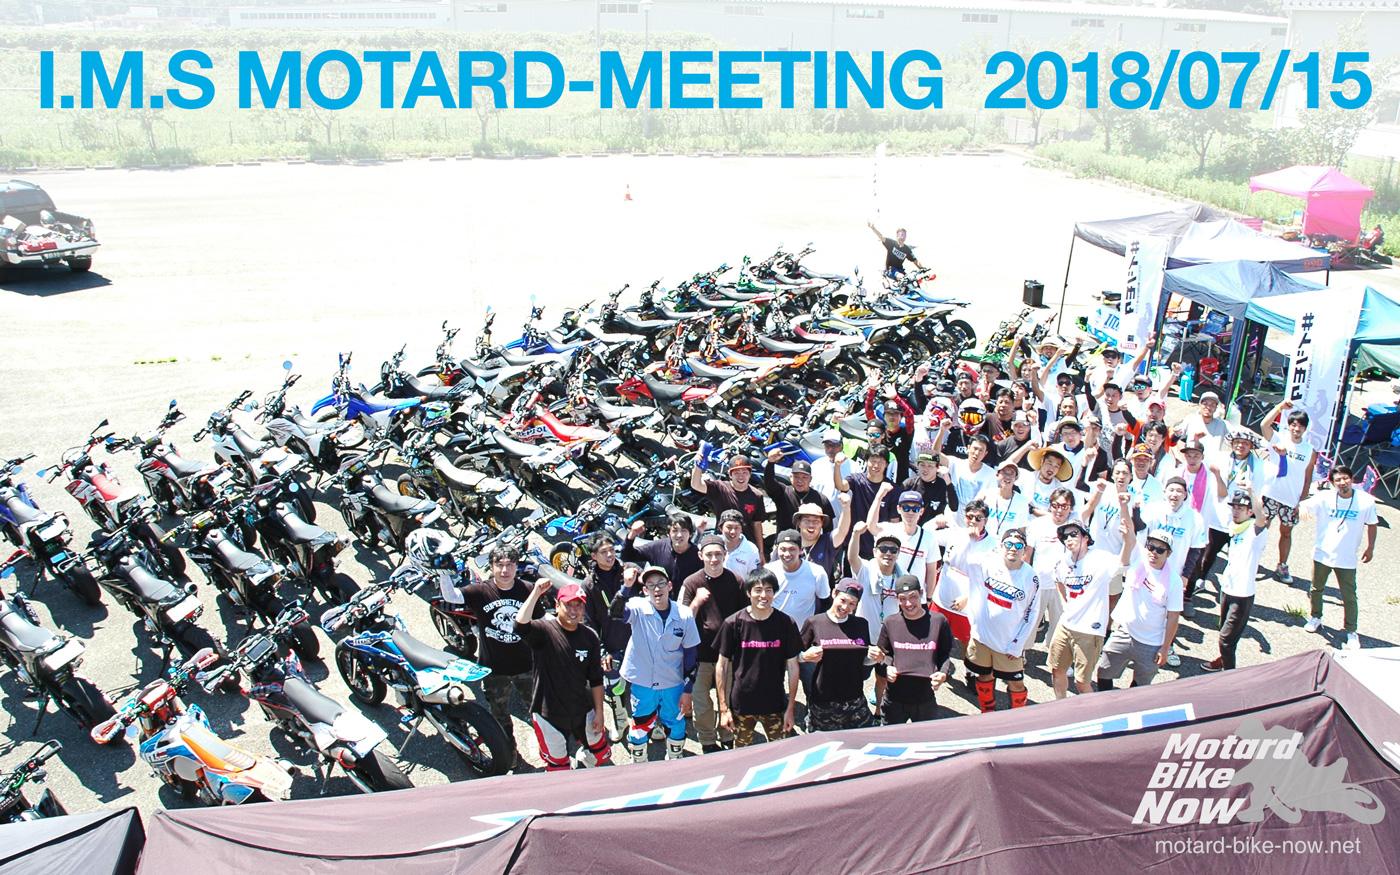 IMS Ishikawa Motorcycle Soceity イシモタ モタードミーティング 集合写真 2018/07/15